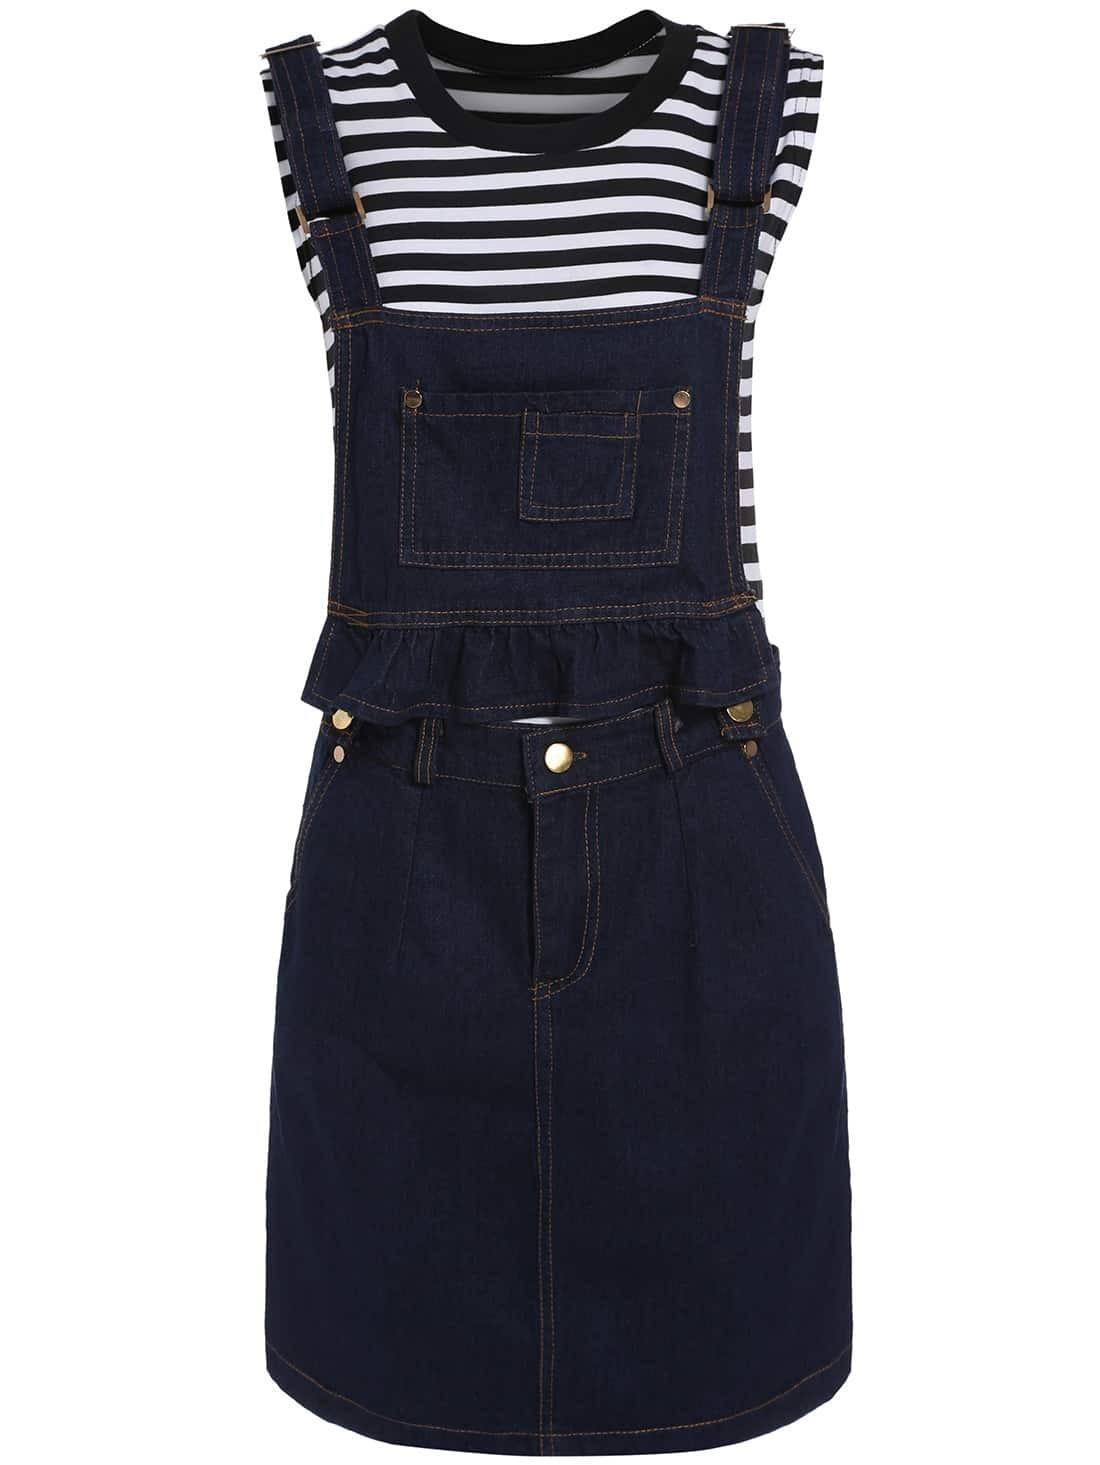 sleeveless striped top with denim skirt